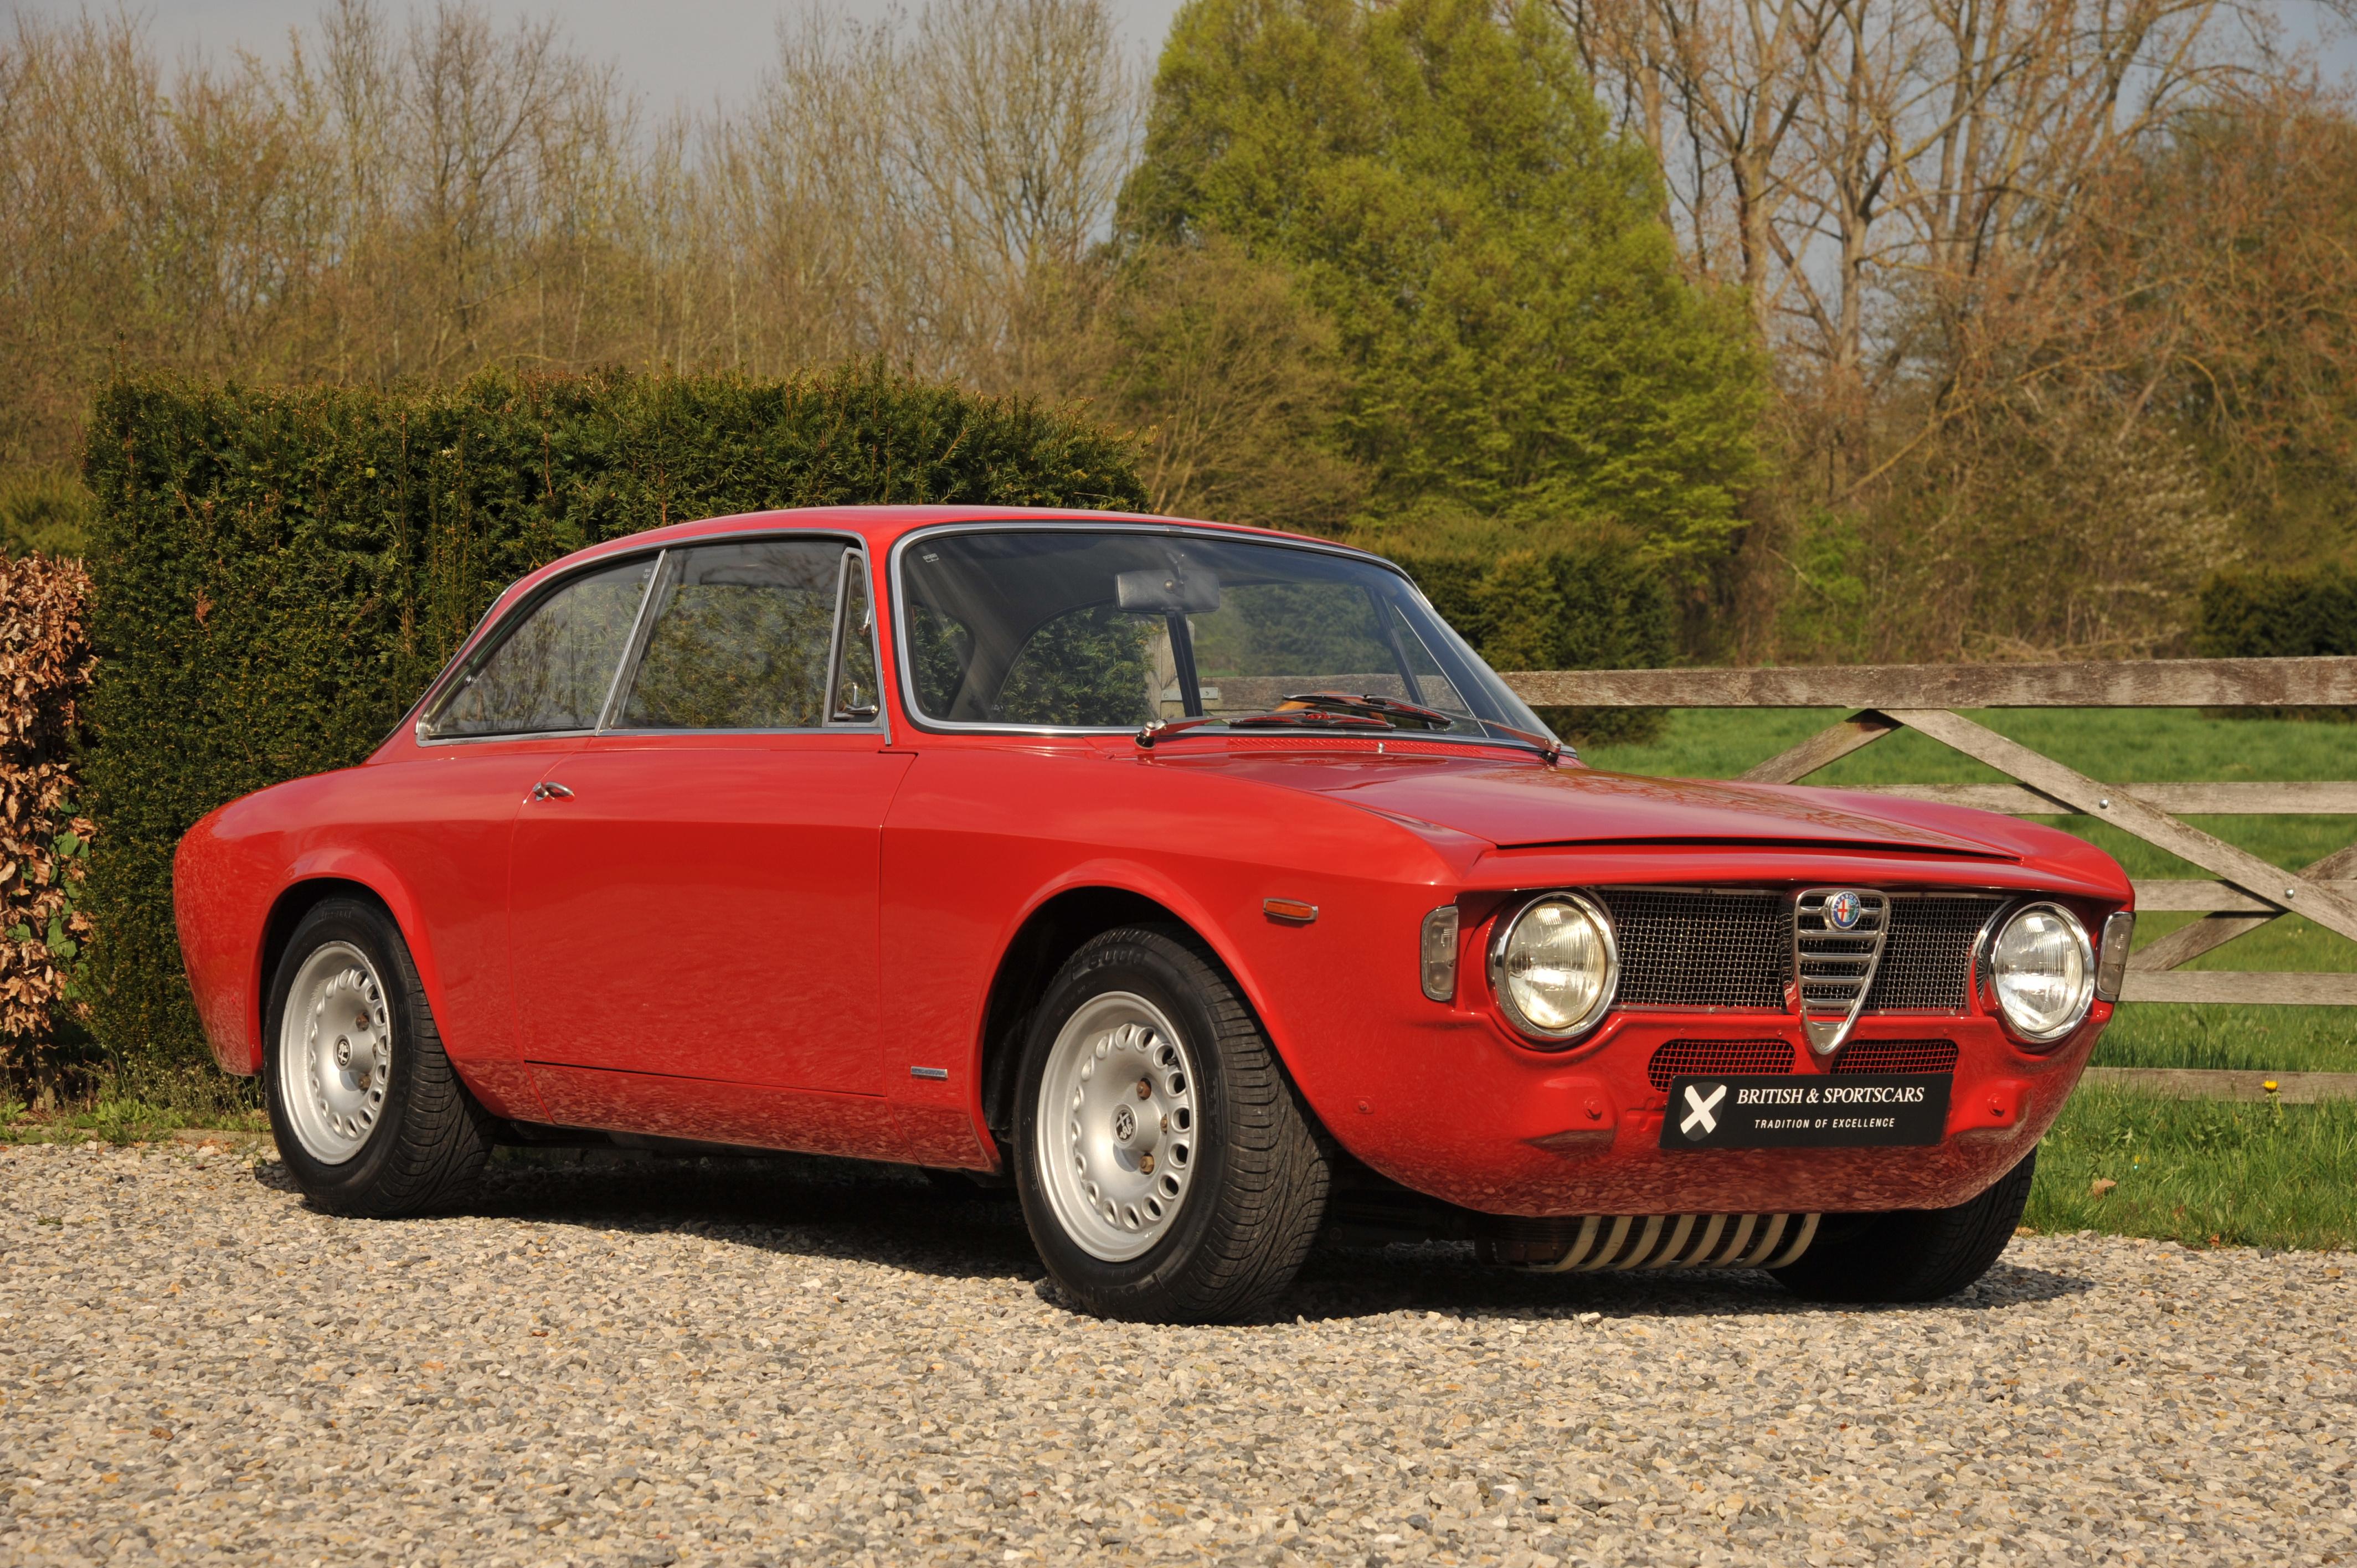 1969 Alfa Romeo Gta Vintage Car For Sale